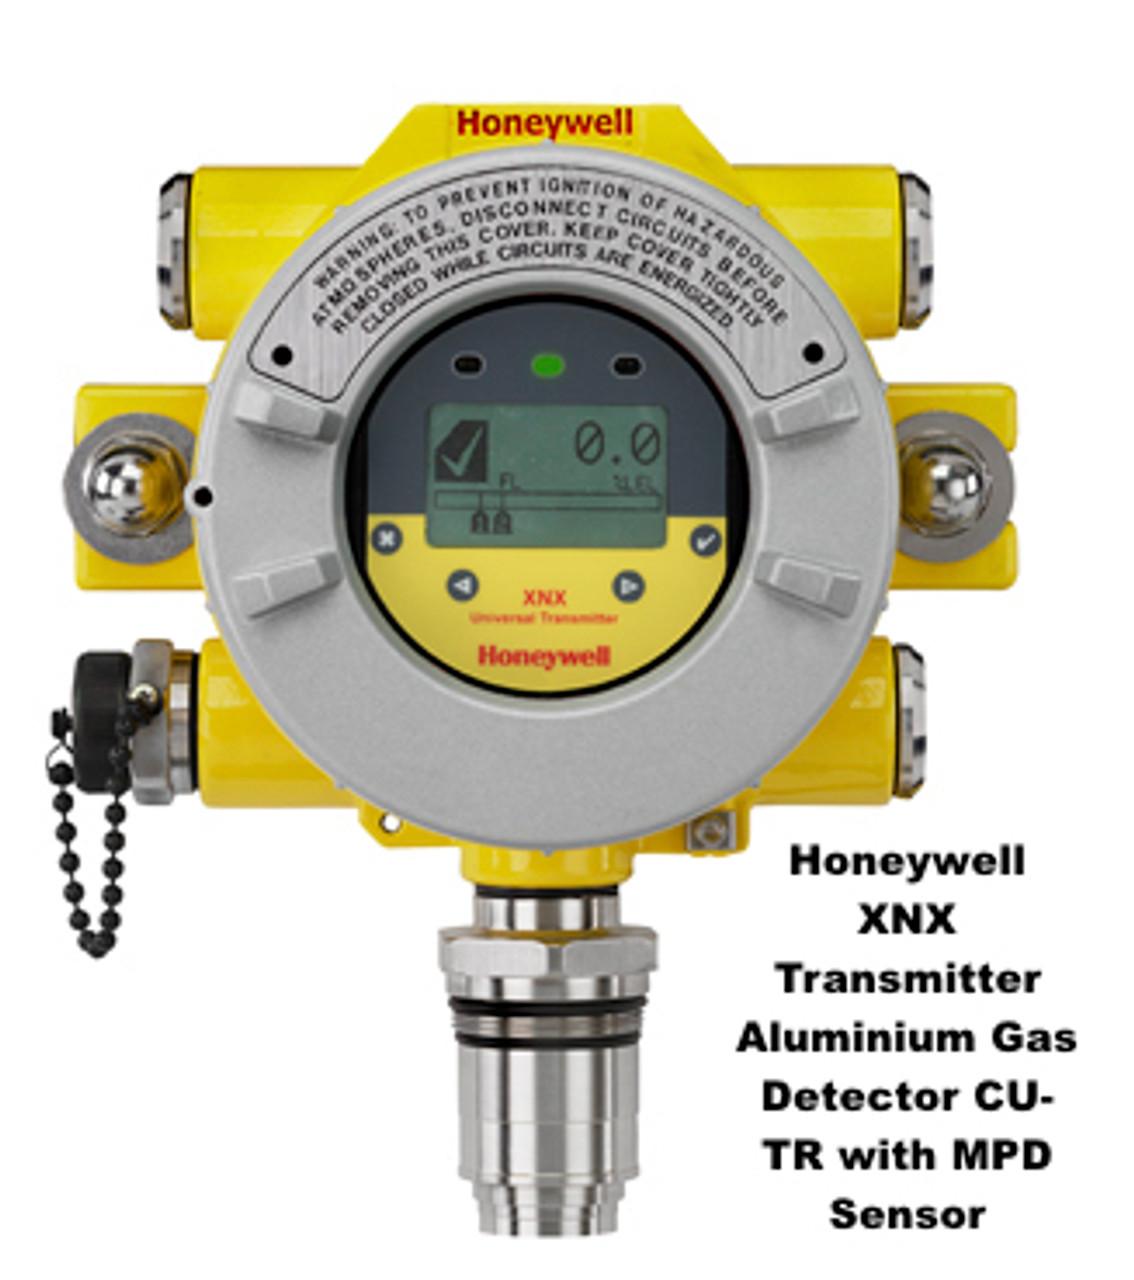 Xnx Transmitter Wiring on